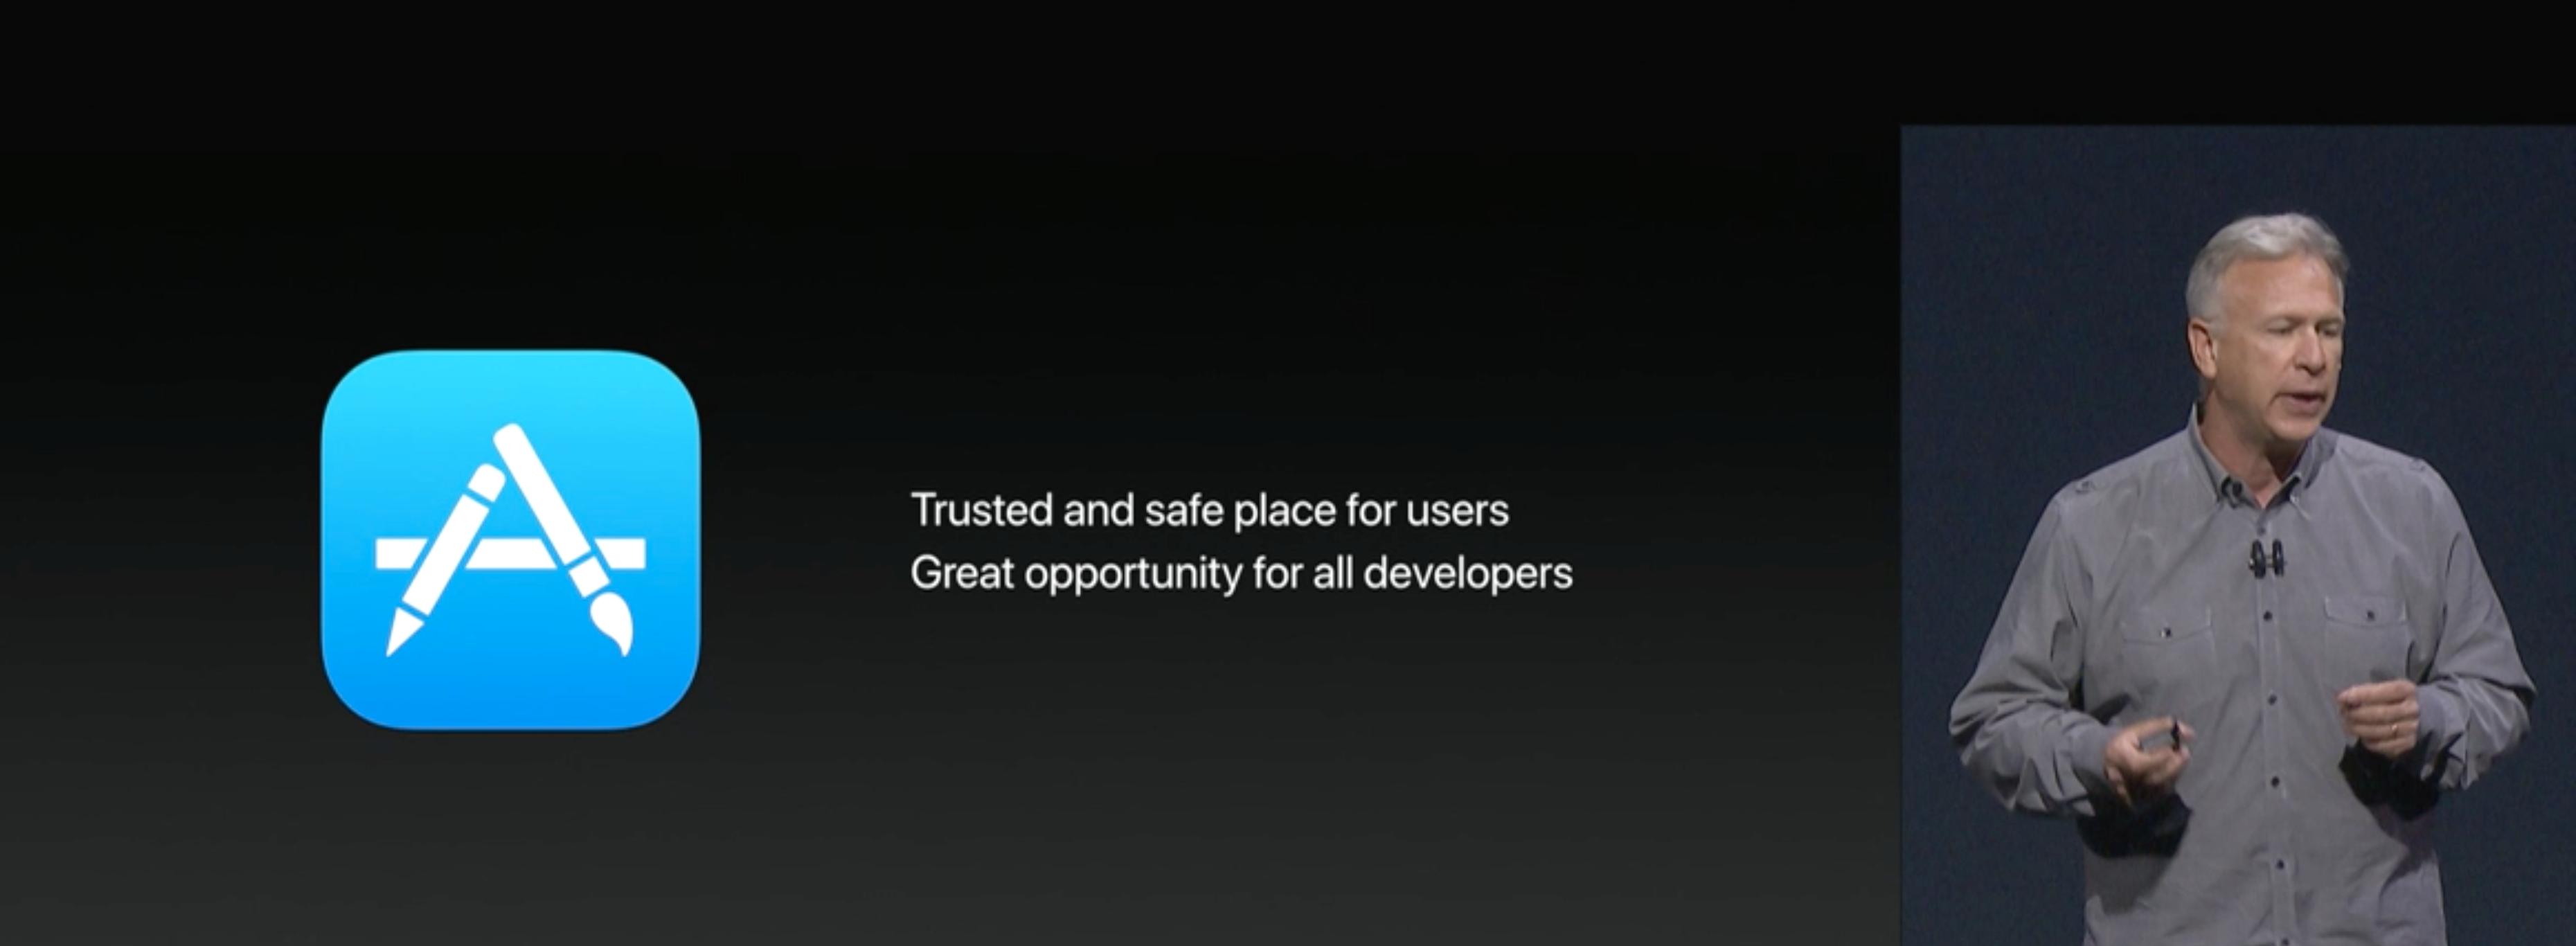 App Store i fokus.